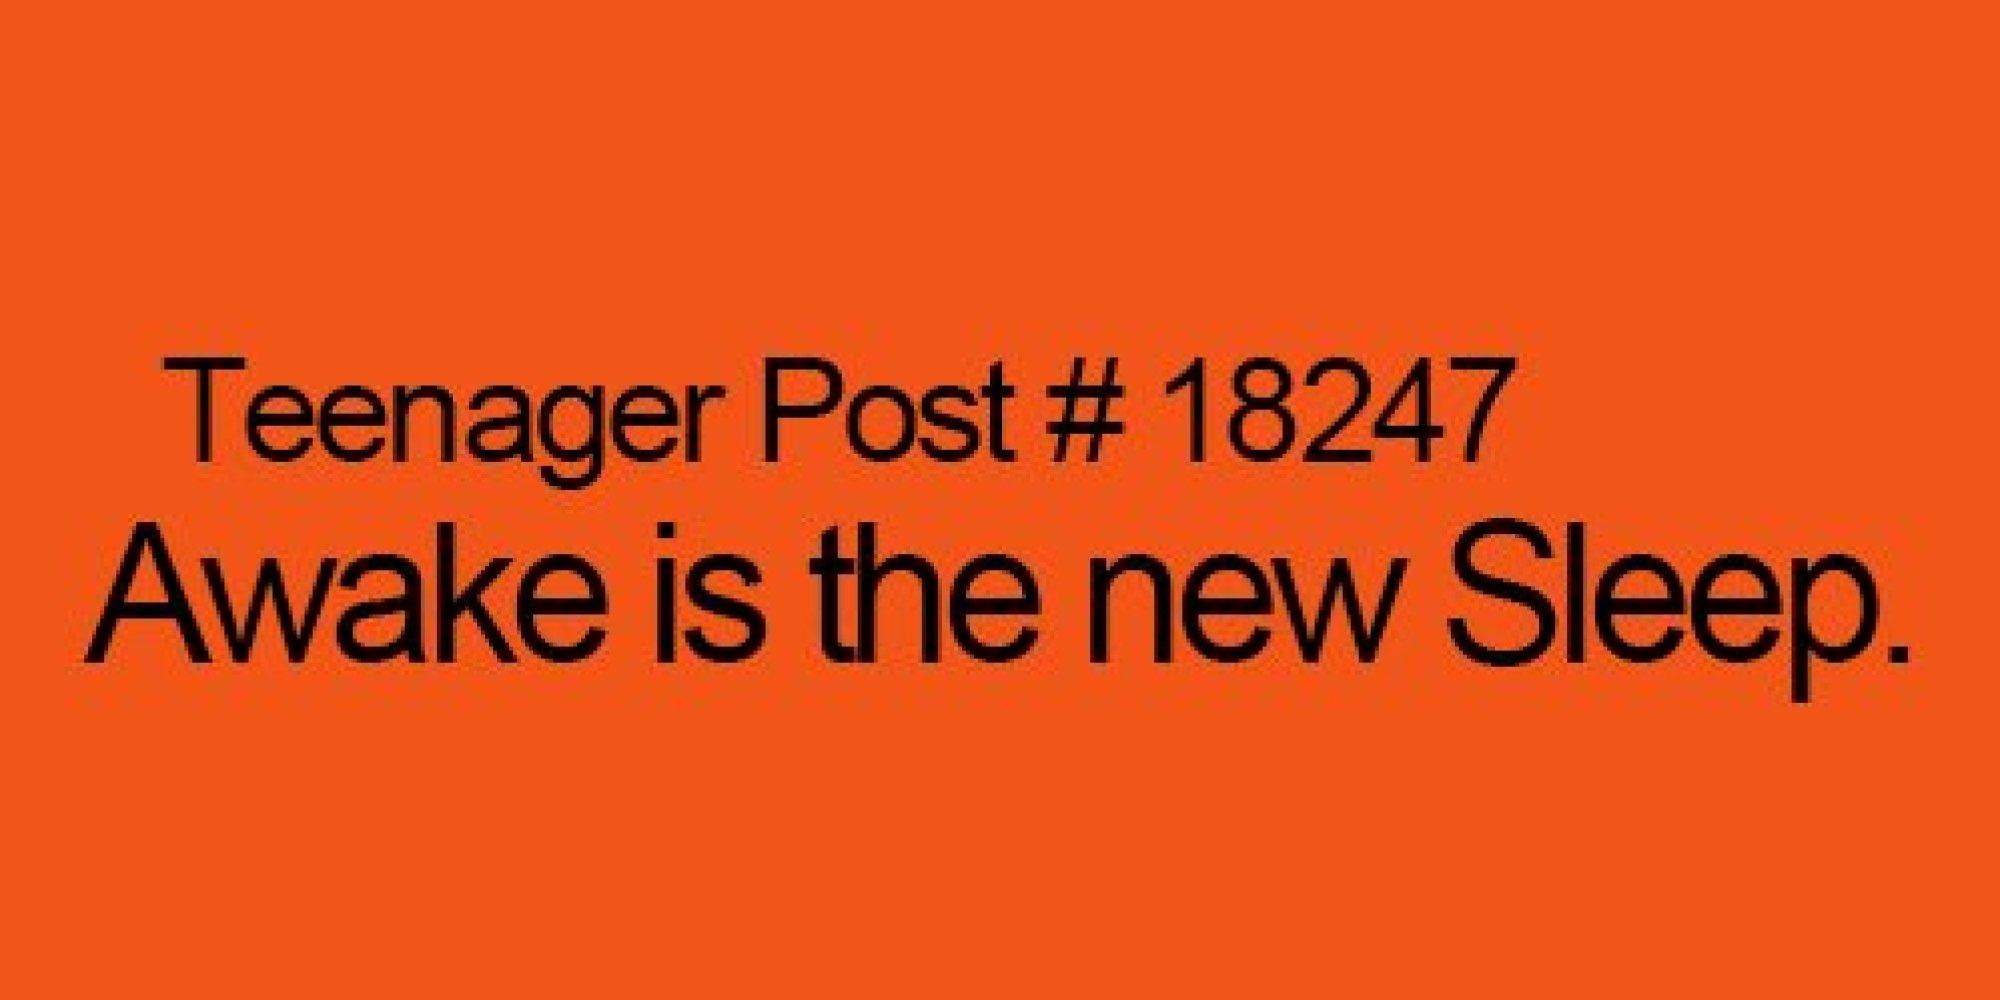 Teenager posts of the week awake is the new sleep